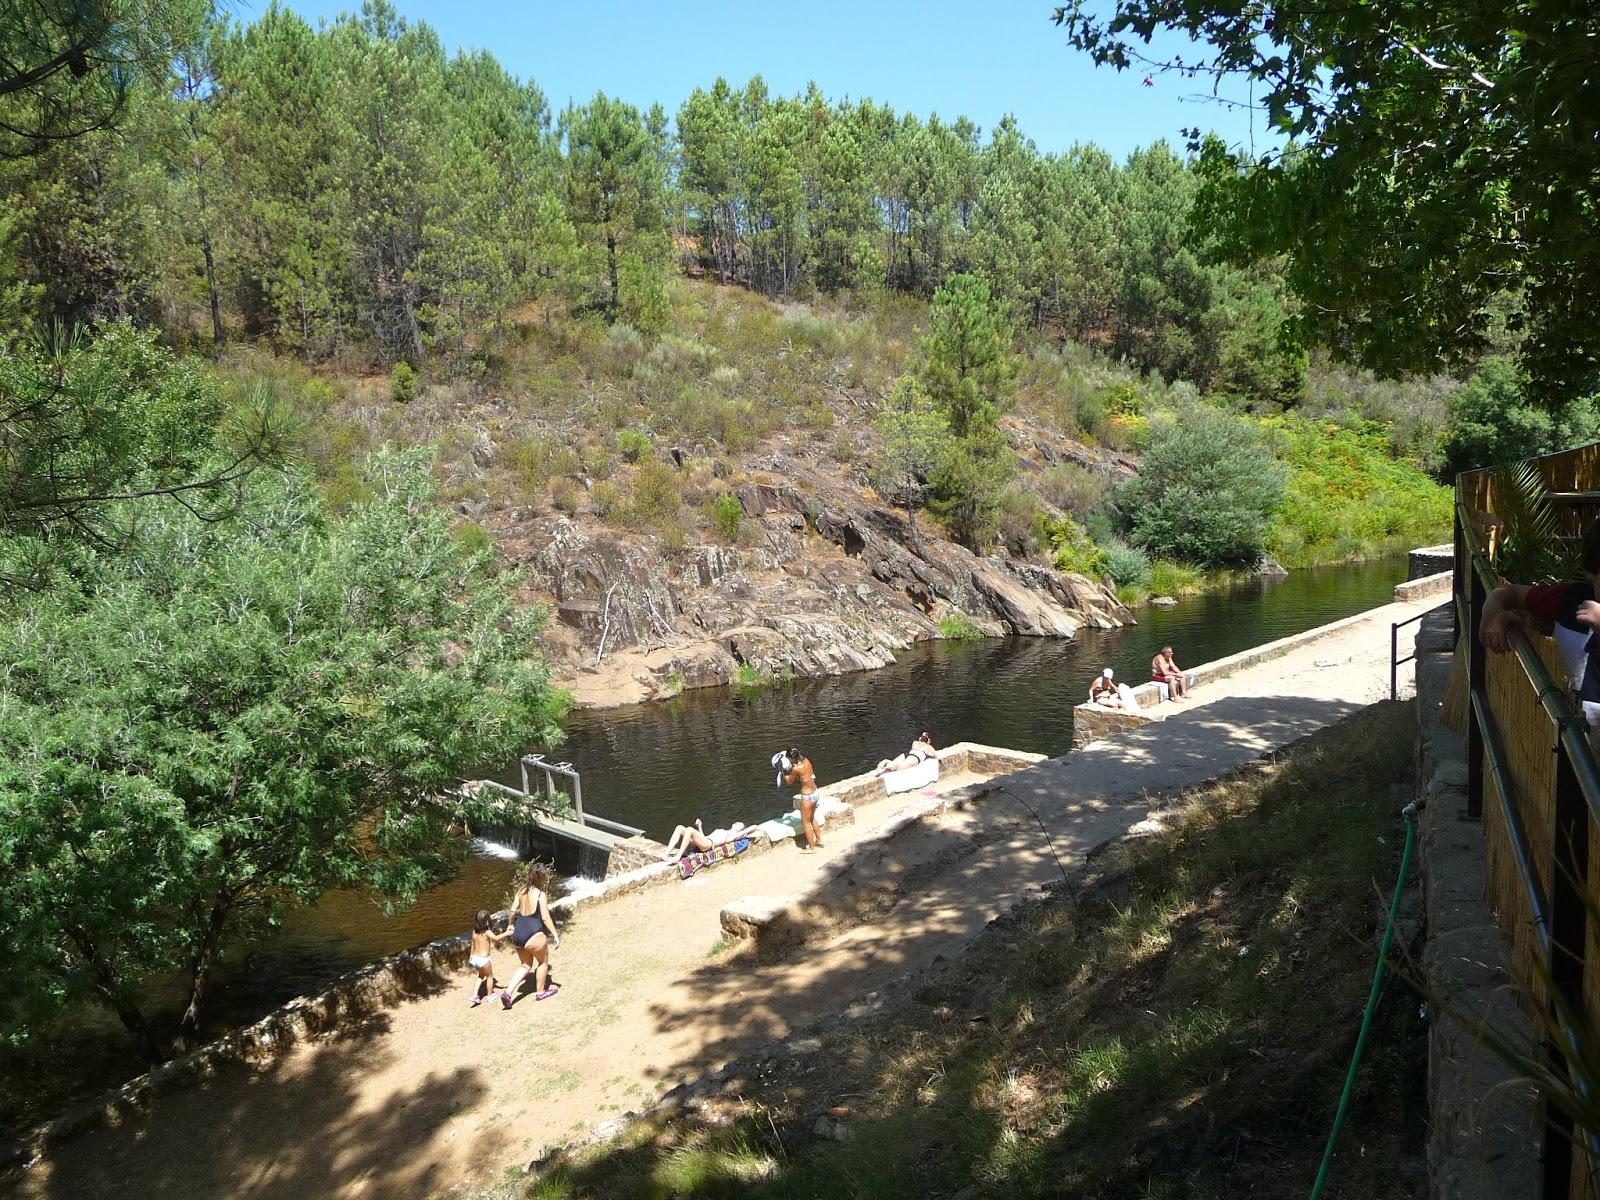 La cachuela la pizarra piscina natural villasbuenas de for Piscinas naturales cerca de caceres